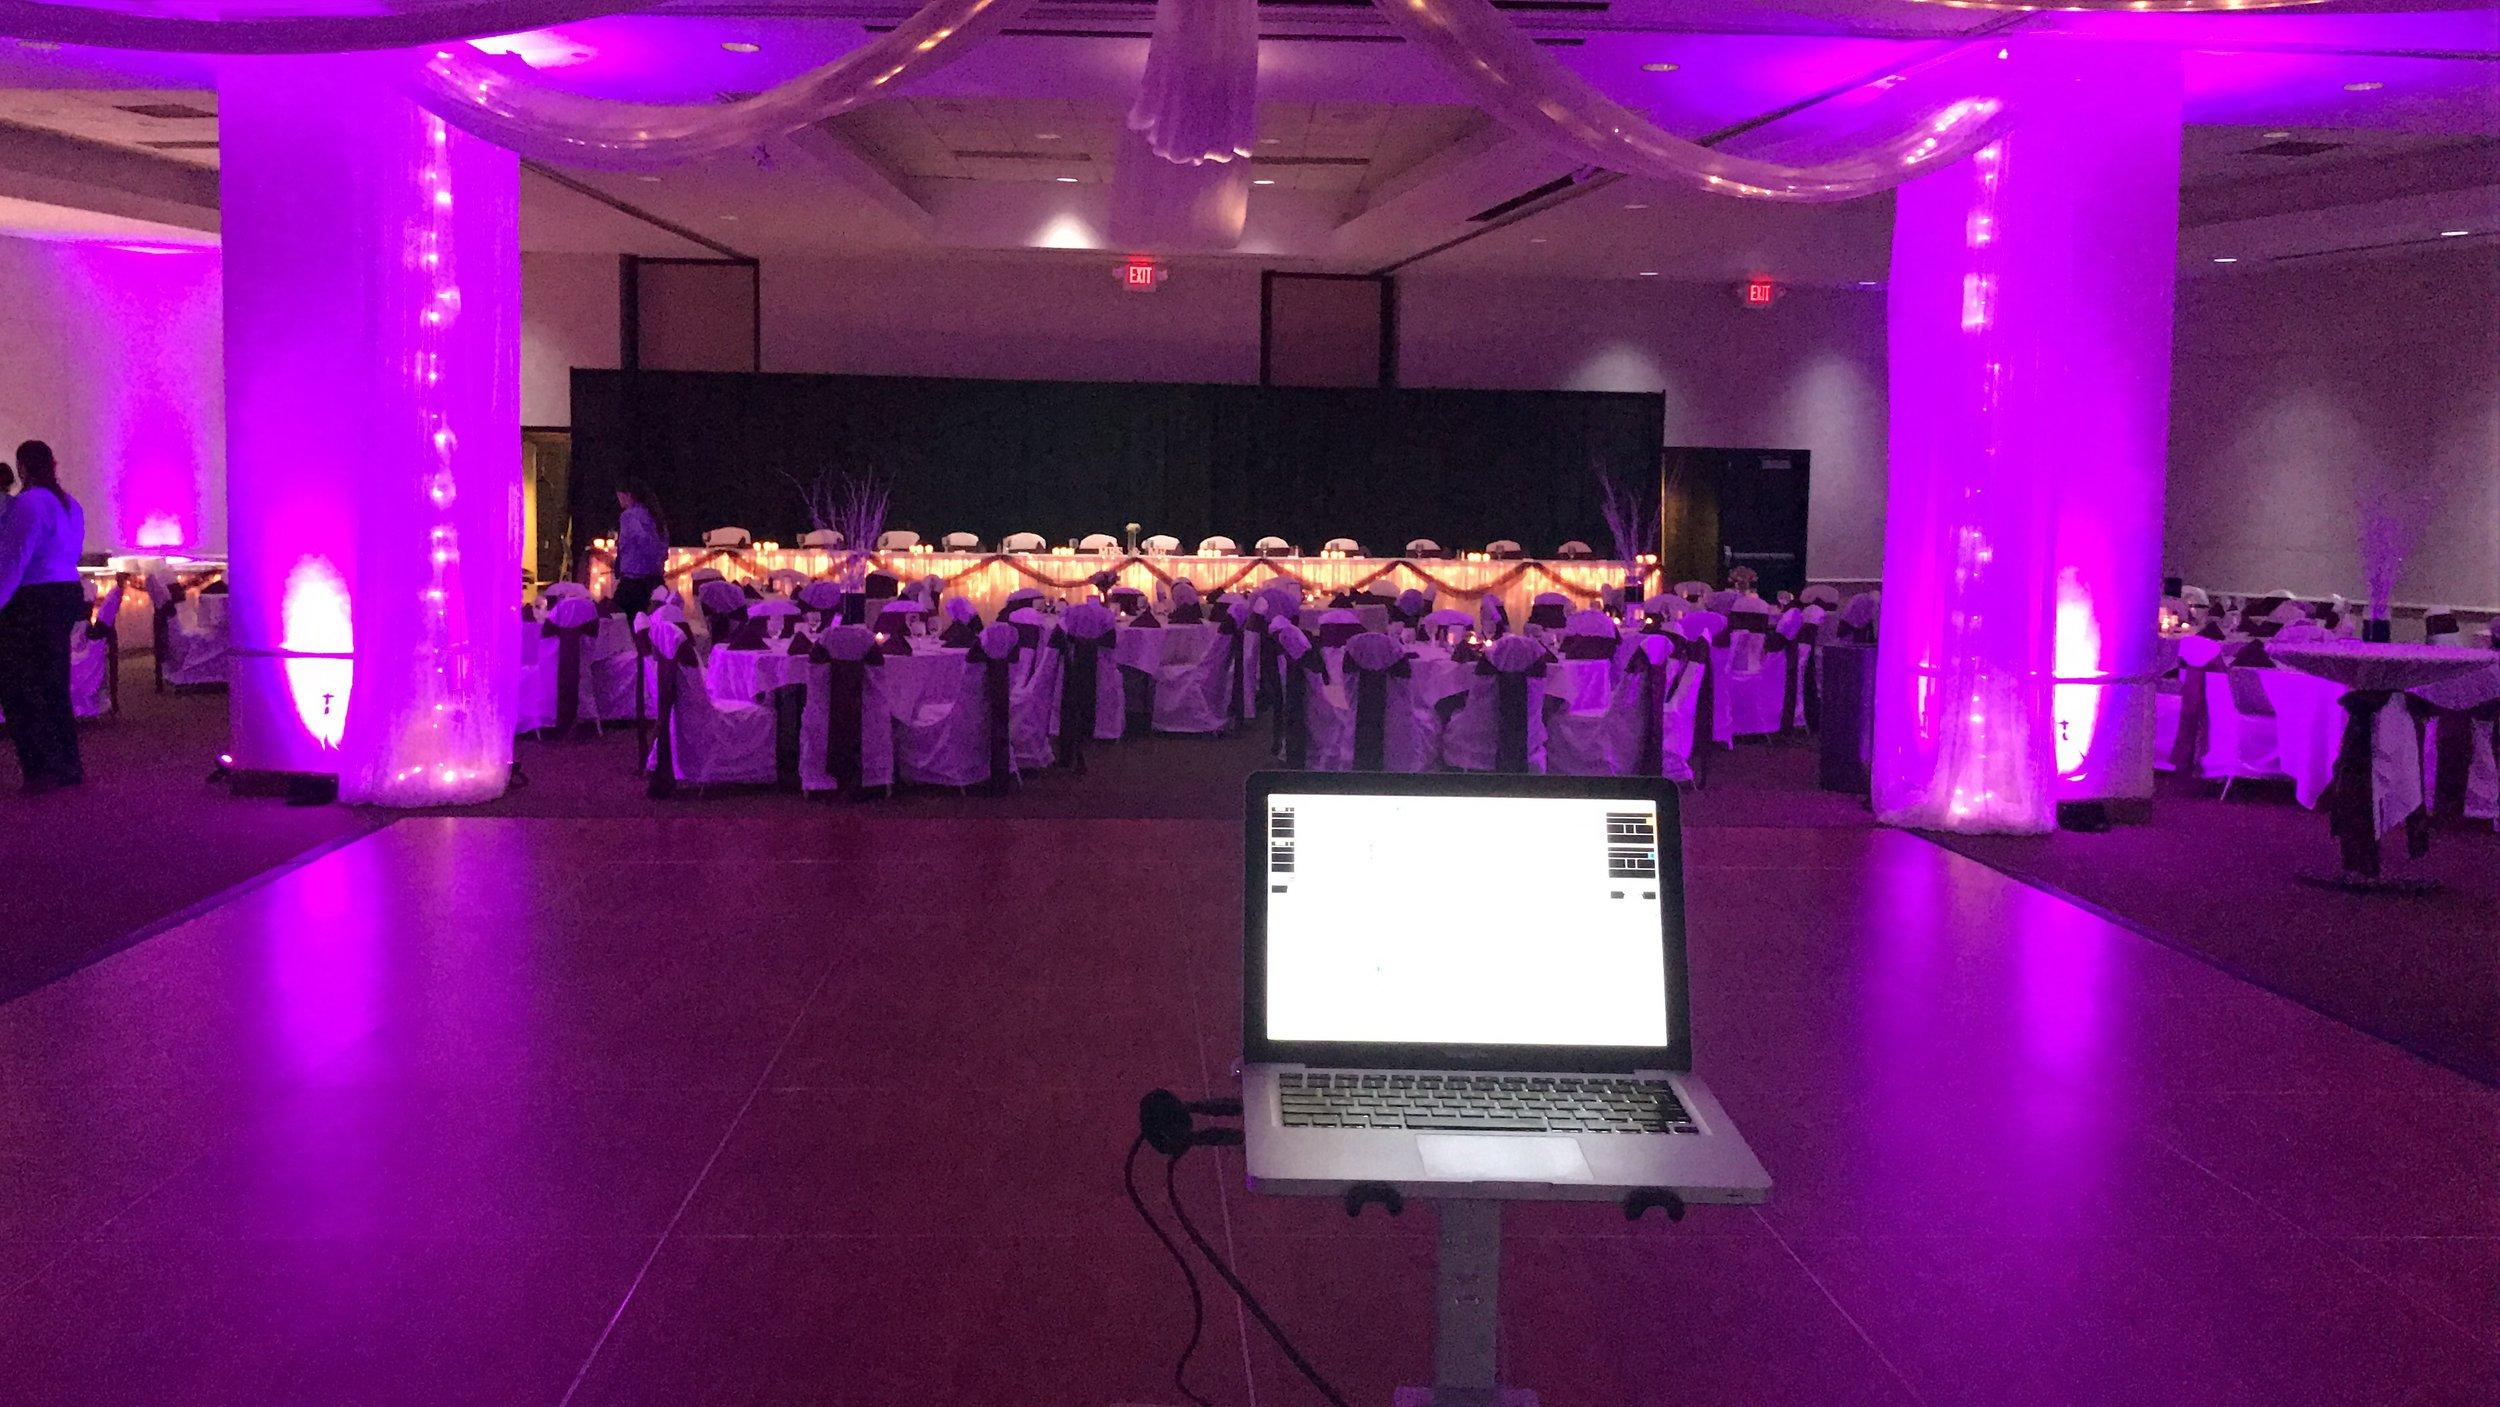 Wedding DJ set up with uplighting